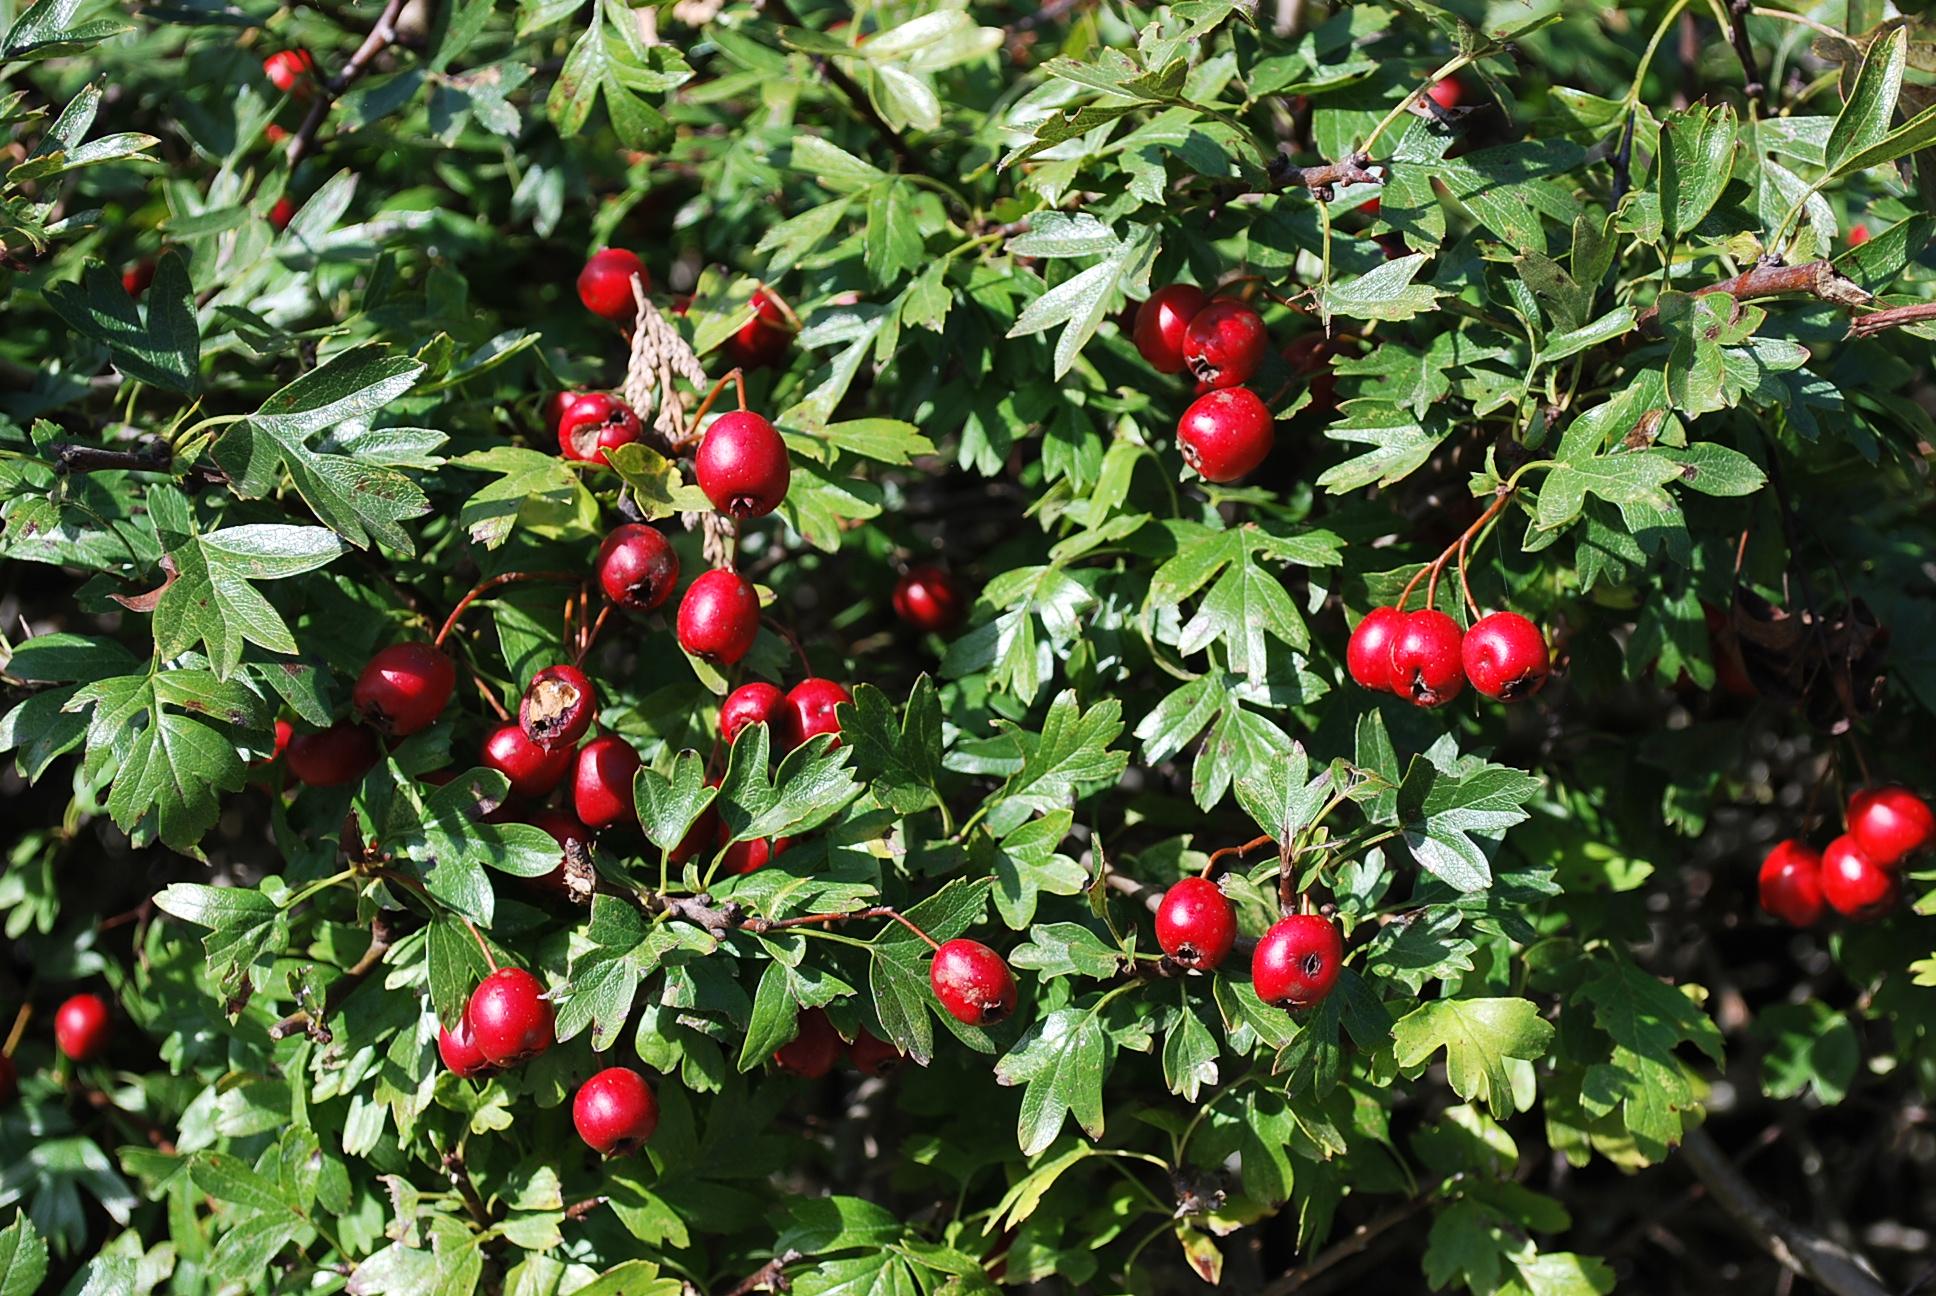 Les Plantes Miracles...Si le pire arrive...( Prophéties ) P35B-crataegus-fruits